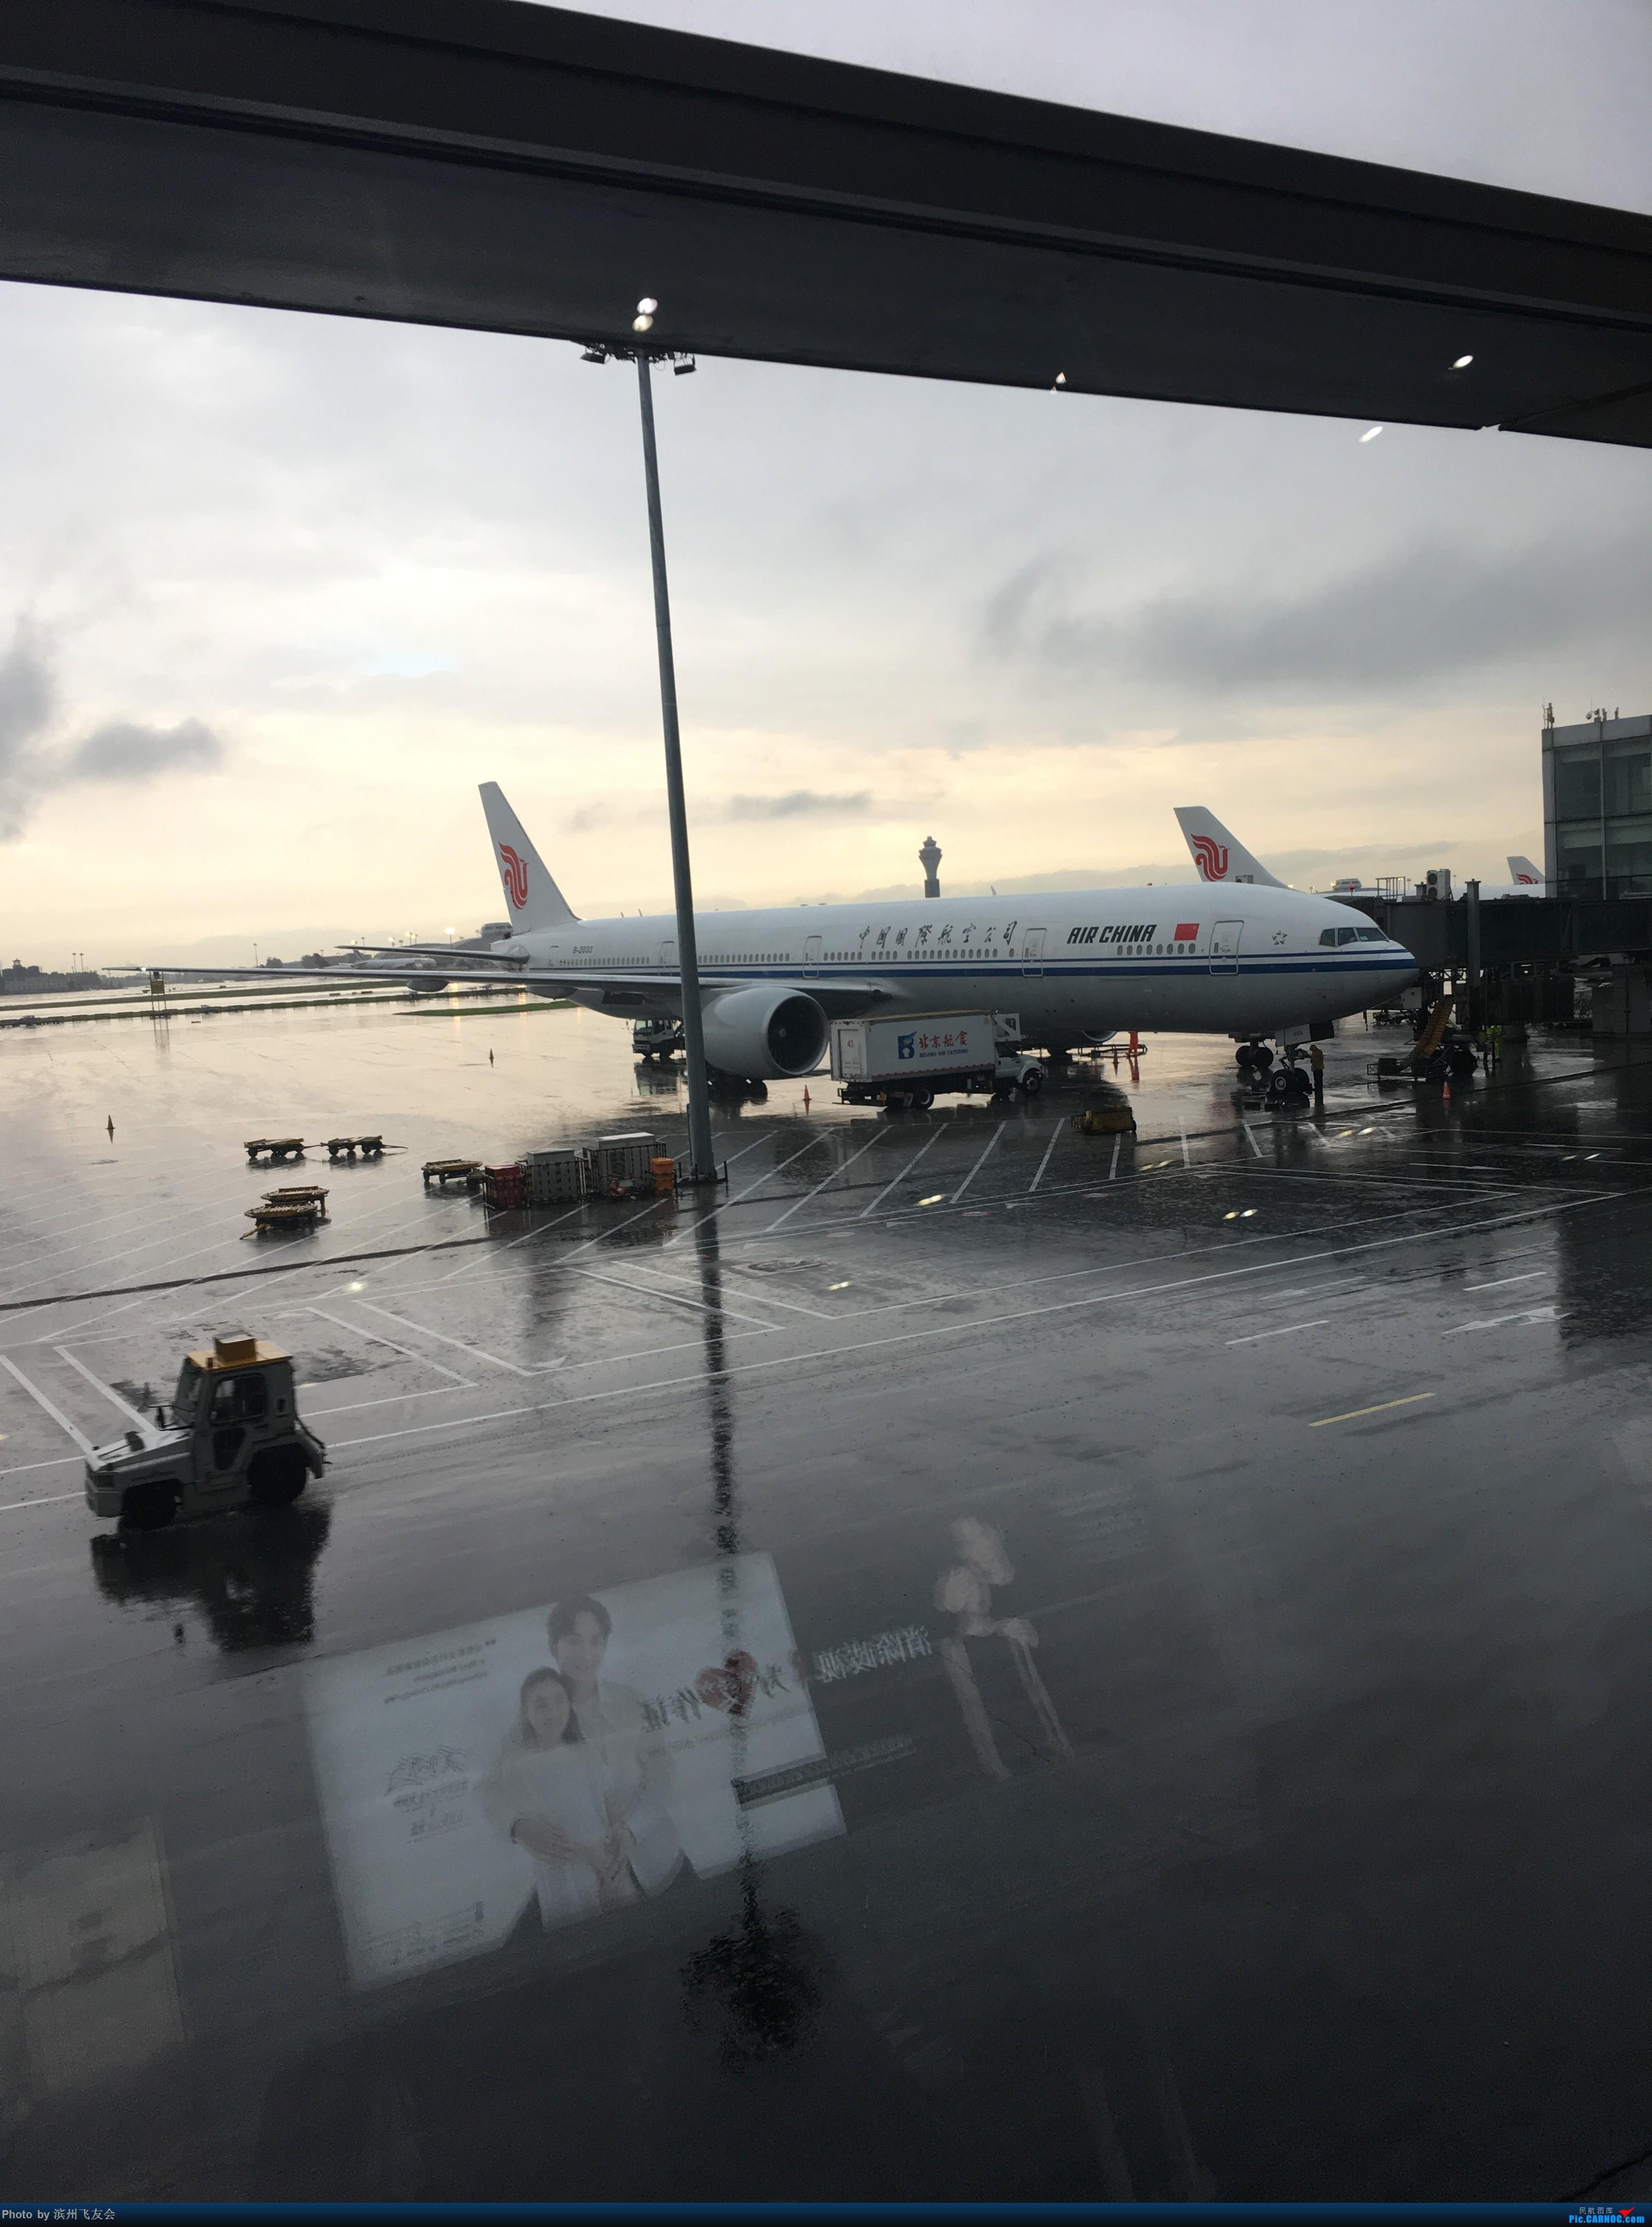 Re:[原创]~骚年飞行篇~补充半年前的香港之路,国航CA111 PEK-HKG,有幸坐到大擦第50架77W BOEING 777-300ER B-2033 中国北京首都国际机场